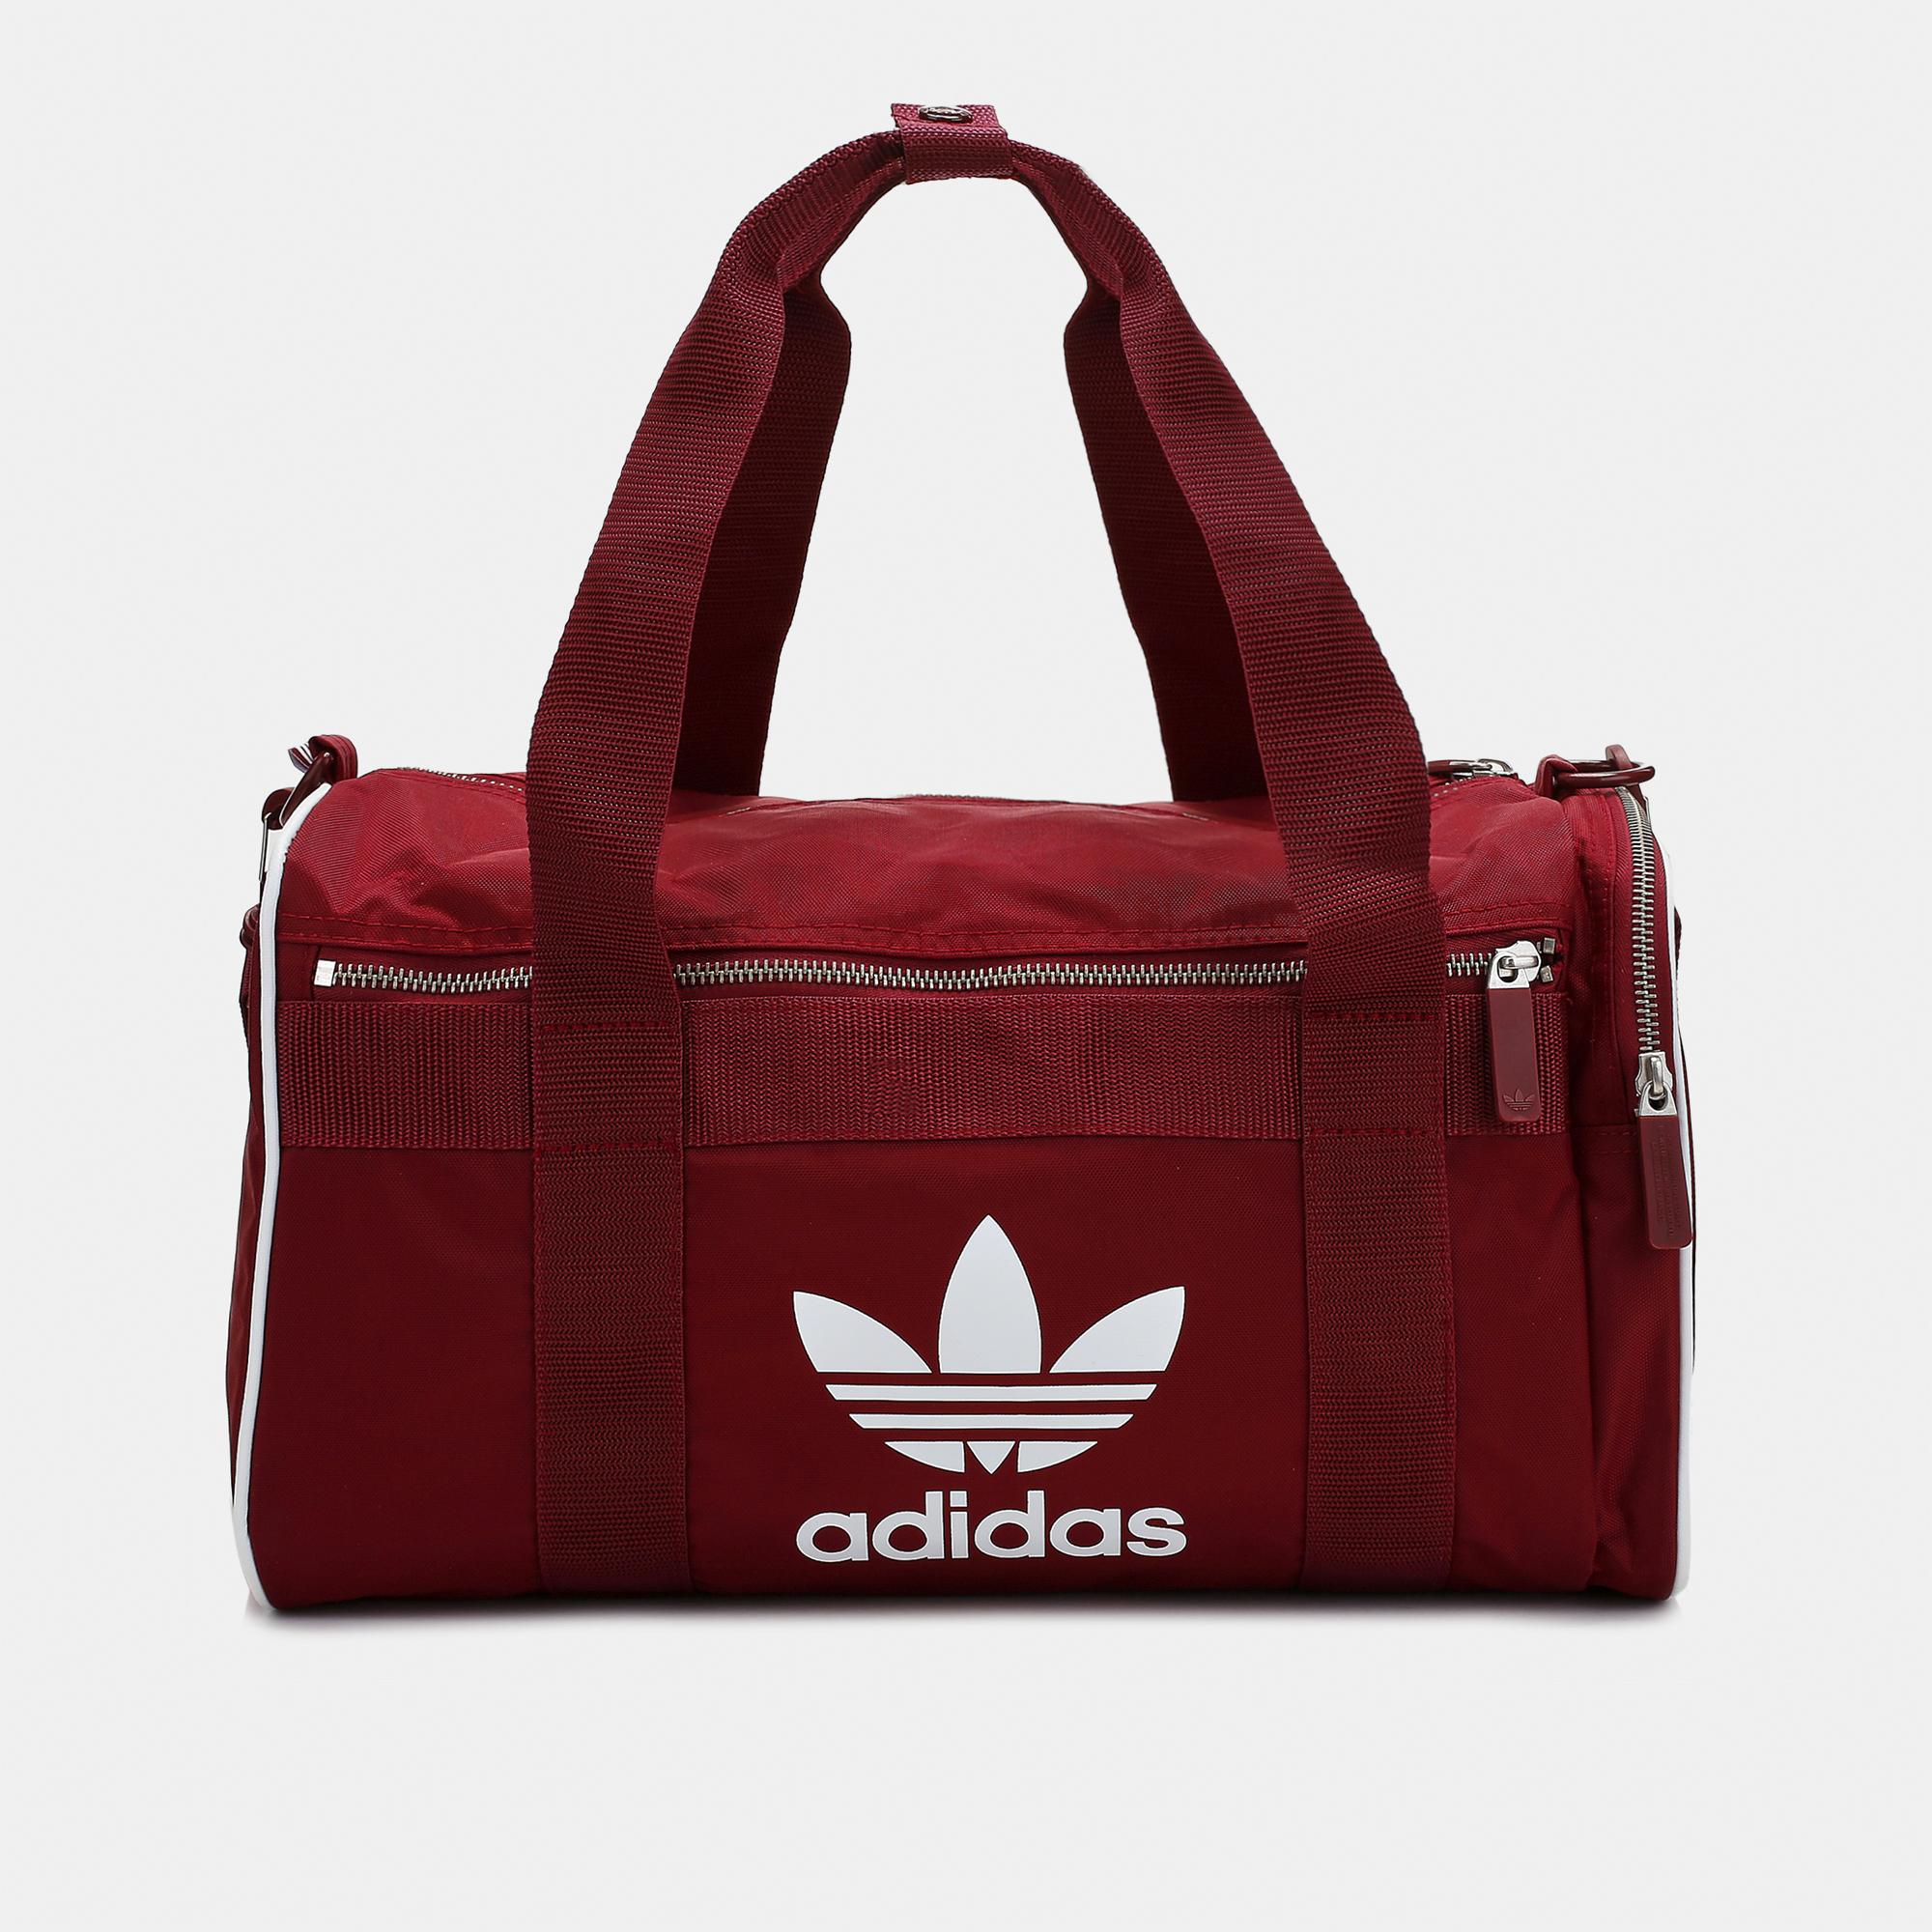 43dd3dc3c7 adidas Originals adicolor Duffel Bag